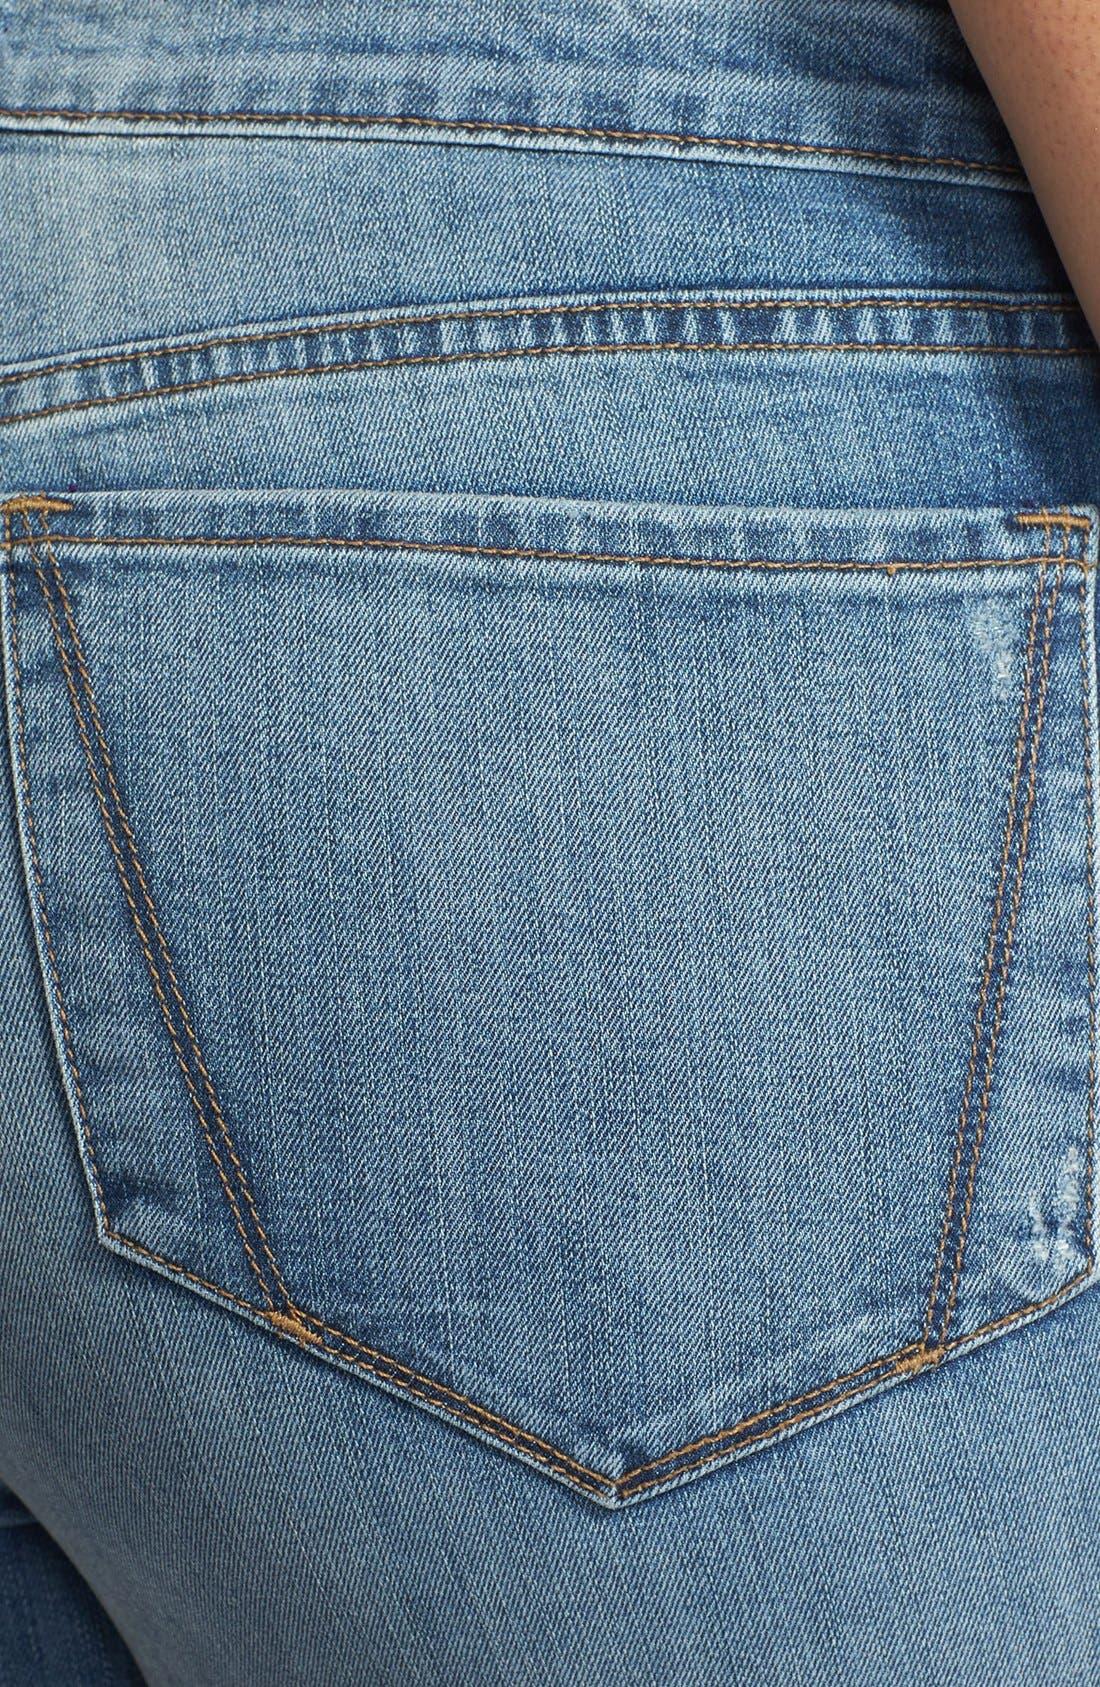 Alternate Image 3  - NYDJ 'Audrey' Stretch Skinny Ankle Jeans (Plus Size)